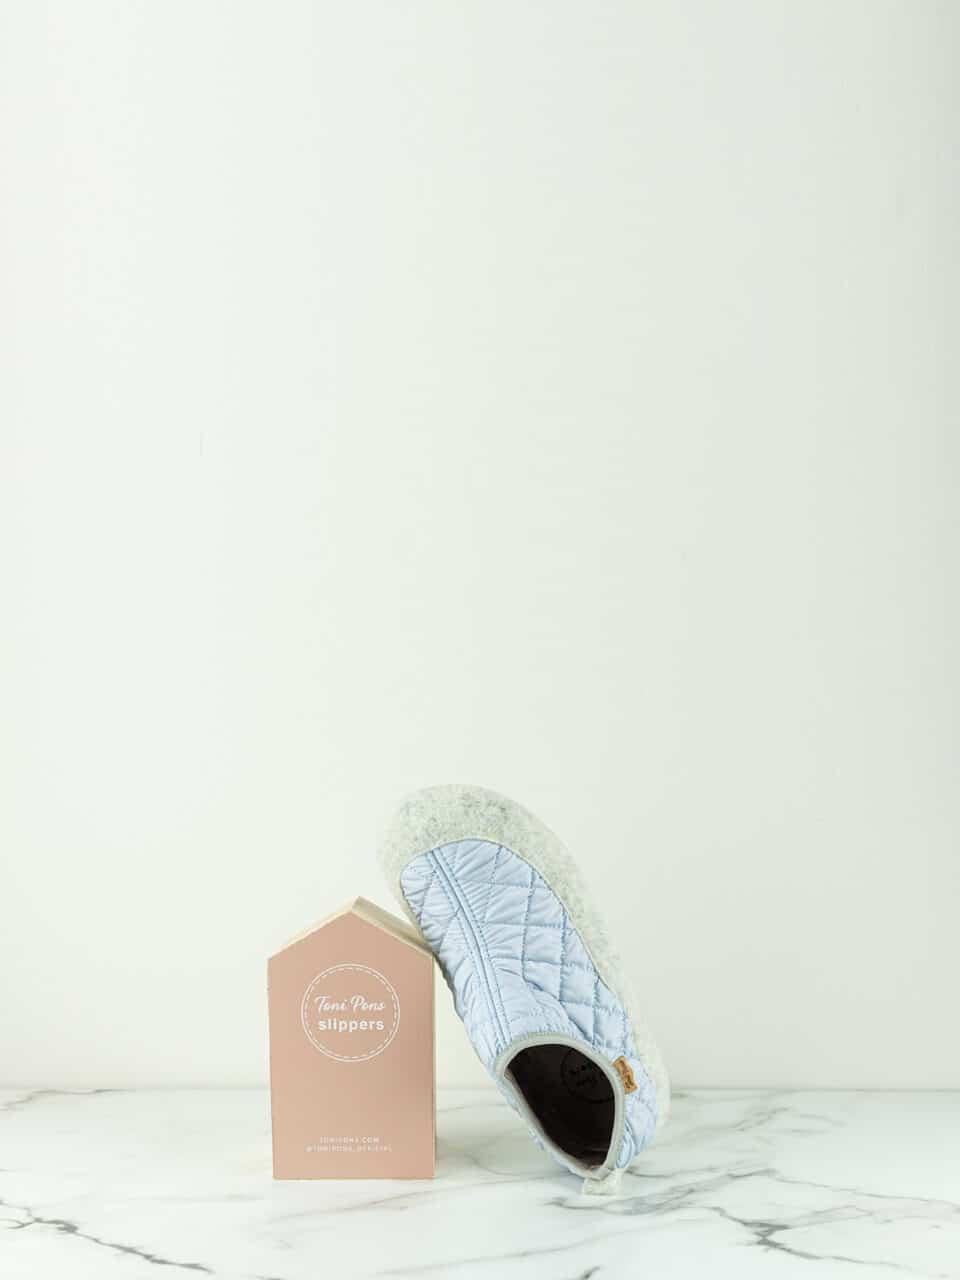 MARE-UM GEL Marcas en Loyna Shoes